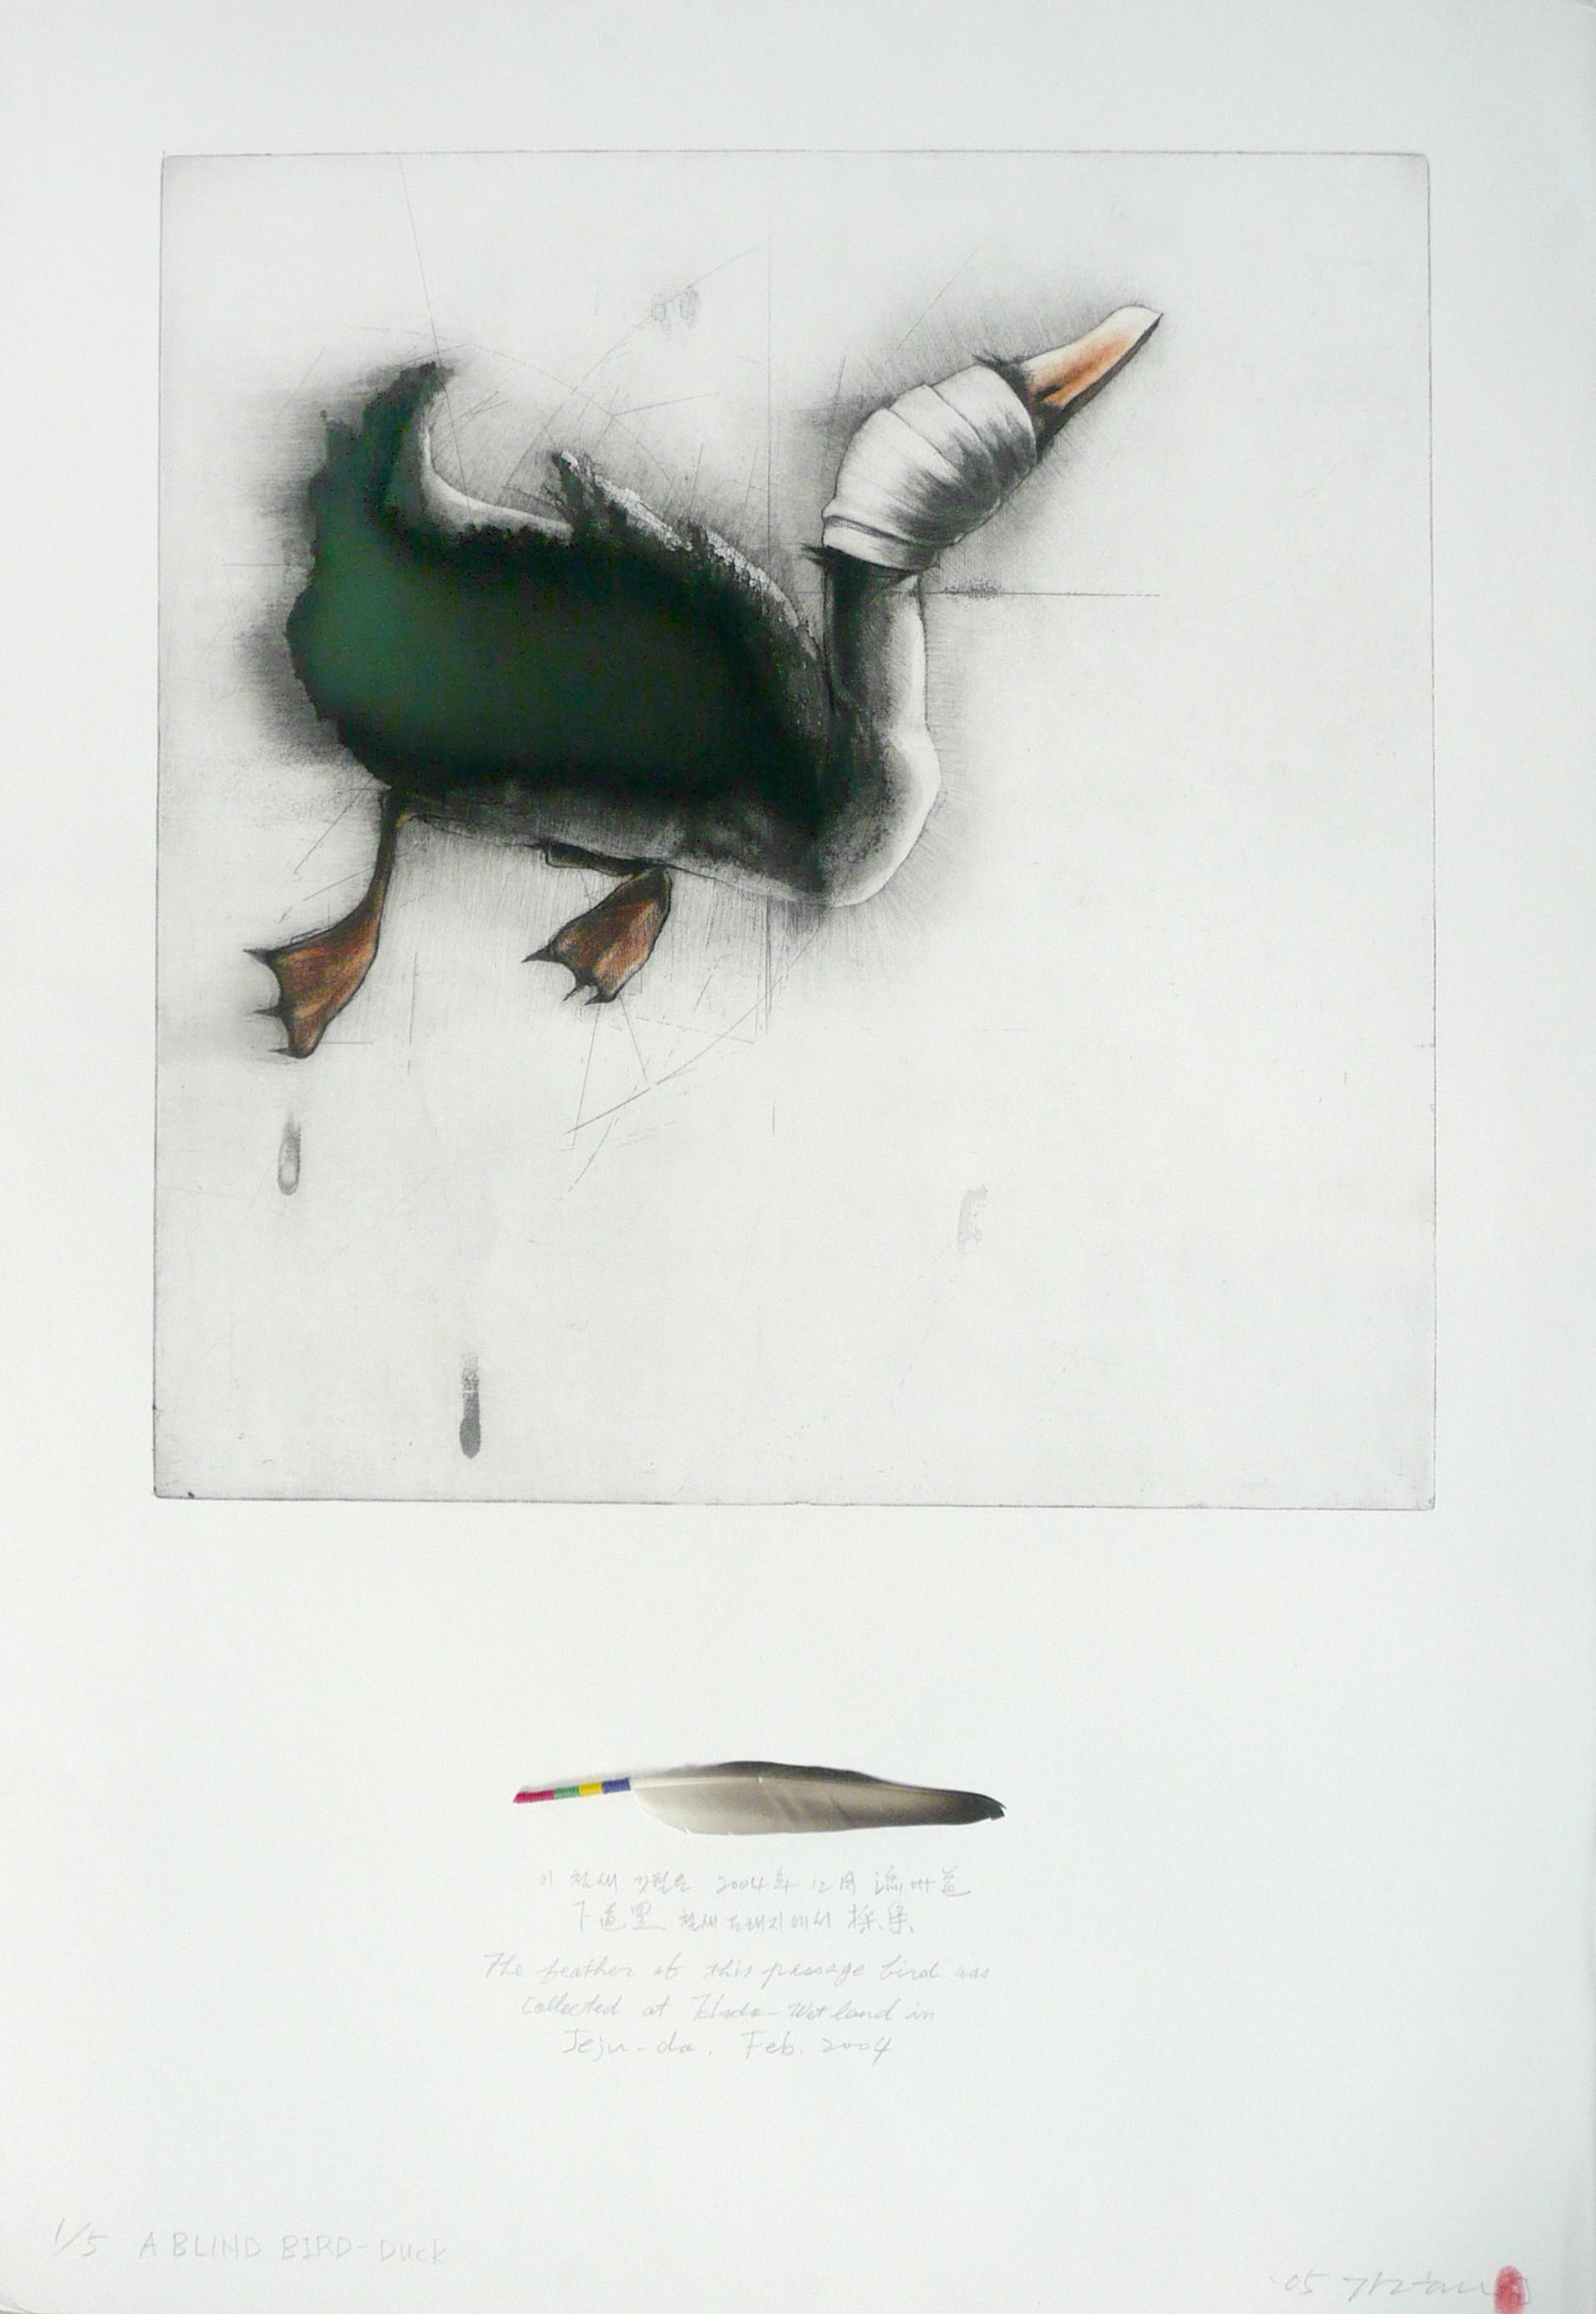 A Blind Bird: Duck (1/5) by Gilchun Koh